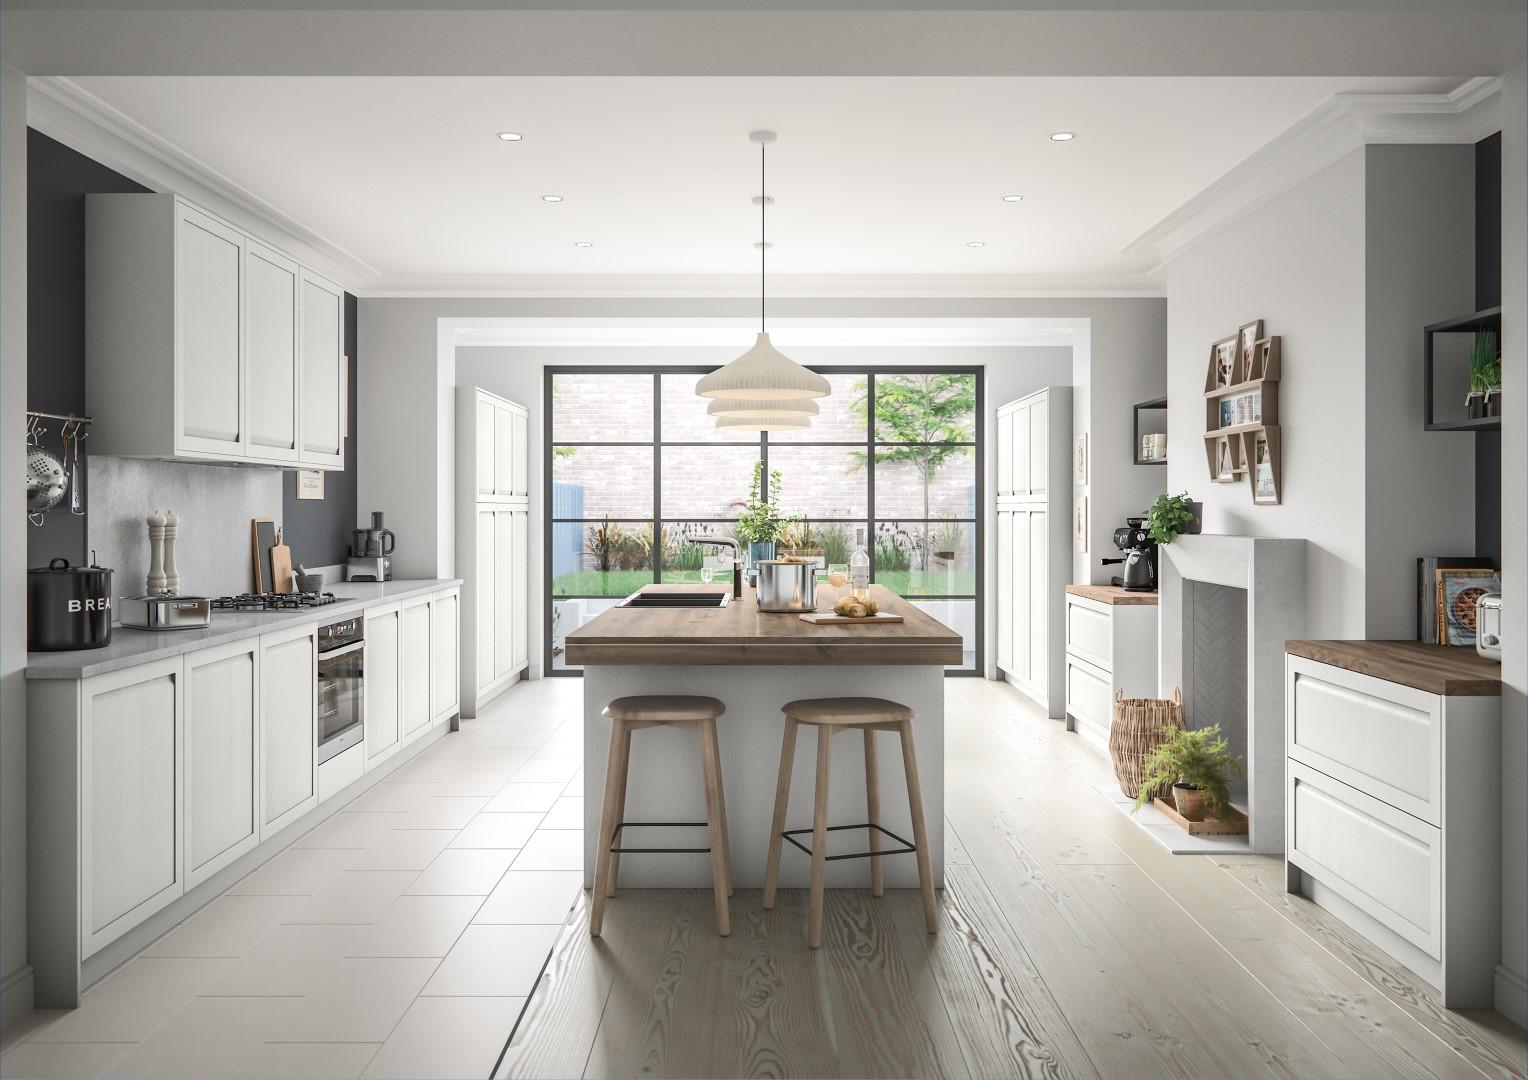 Harborne Light Grey - Kitchen Design - Alan Kelly Kitchens - Waterford - 5